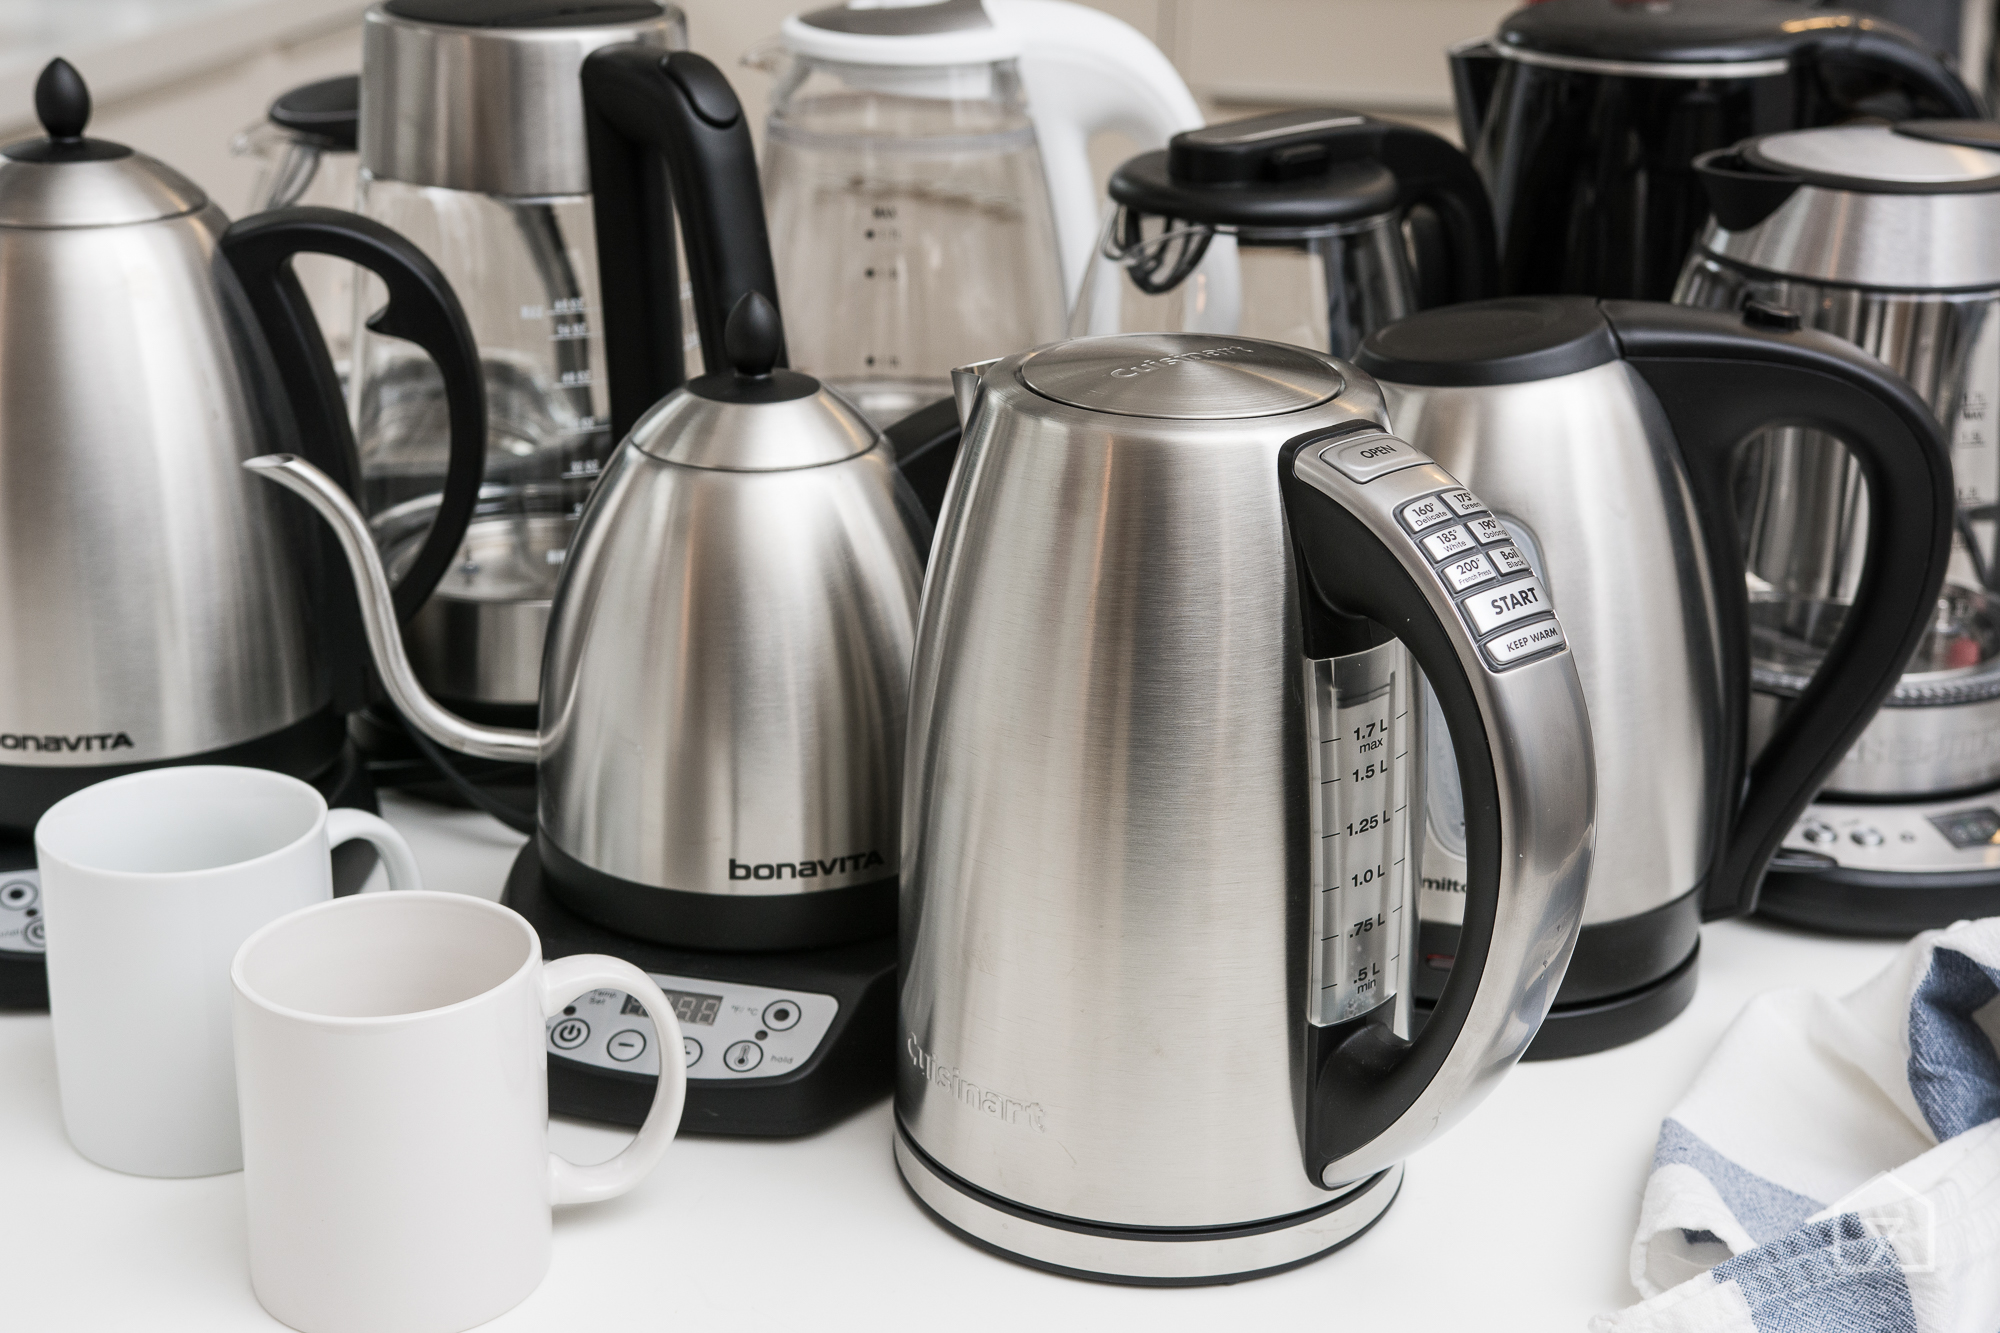 01-electric-kettle-2000.jpg